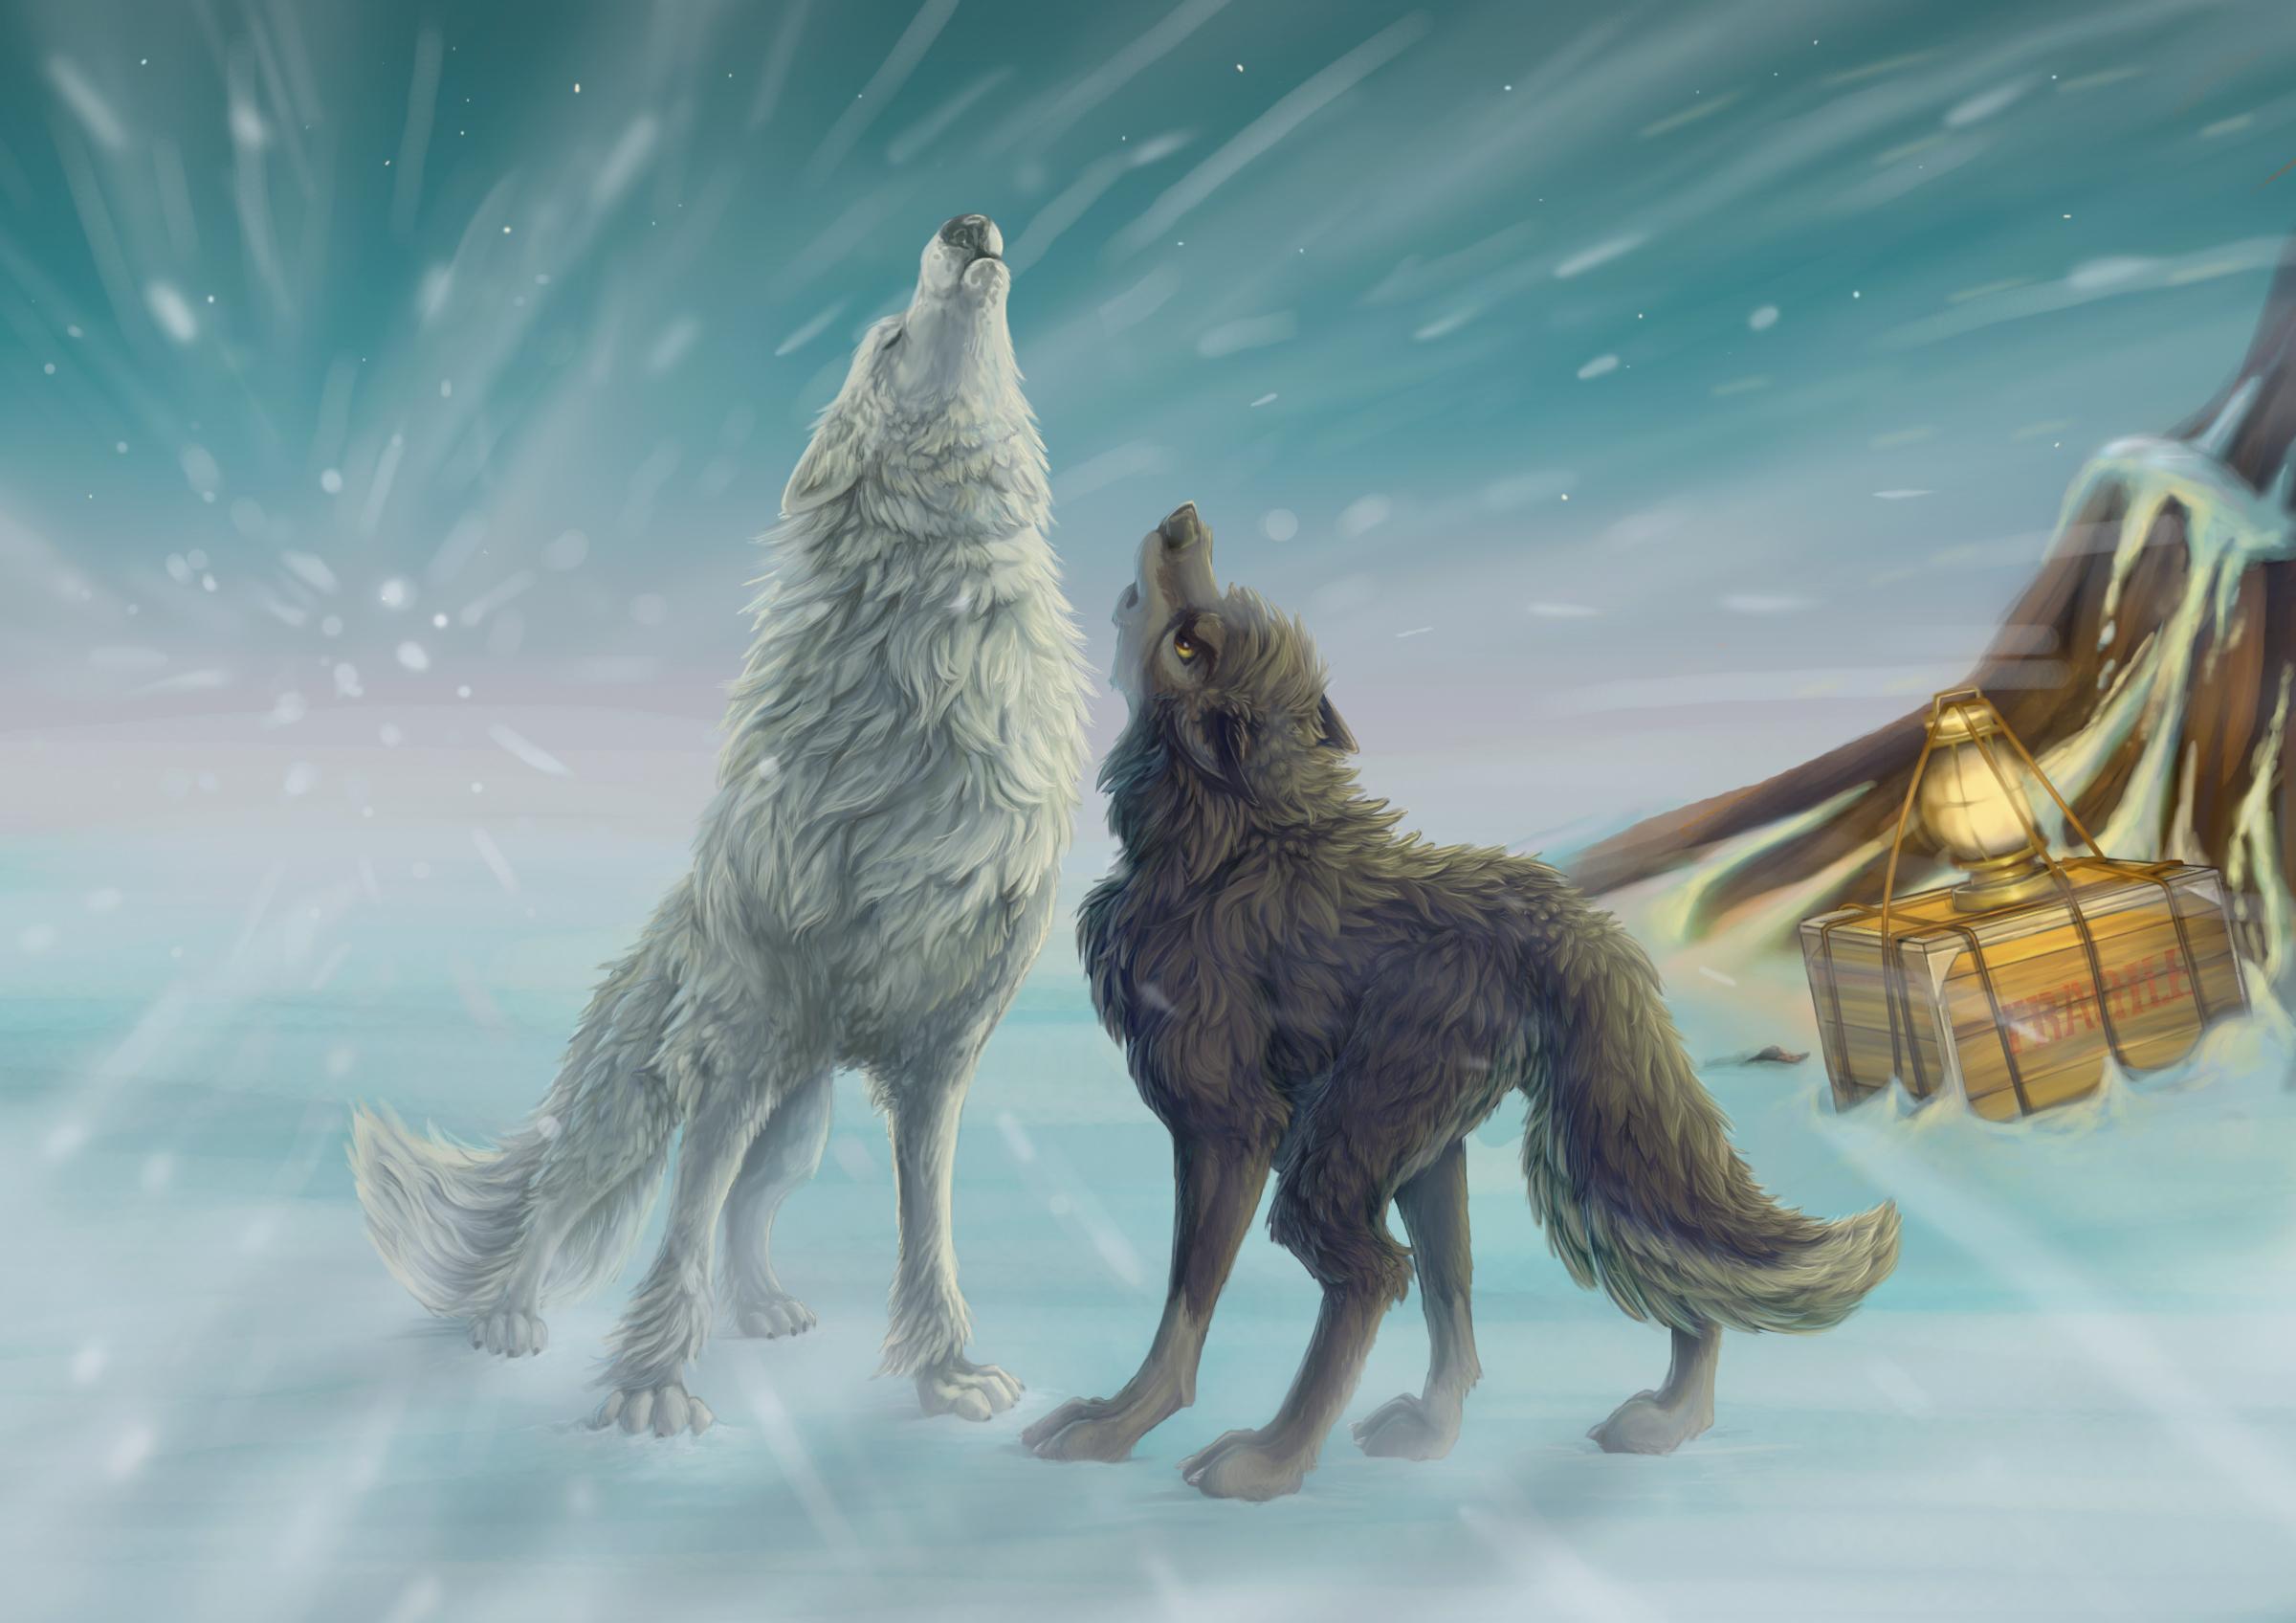 Wolf Howl Drawing wallpaper | 2400x1696 | 97193 | WallpaperUP